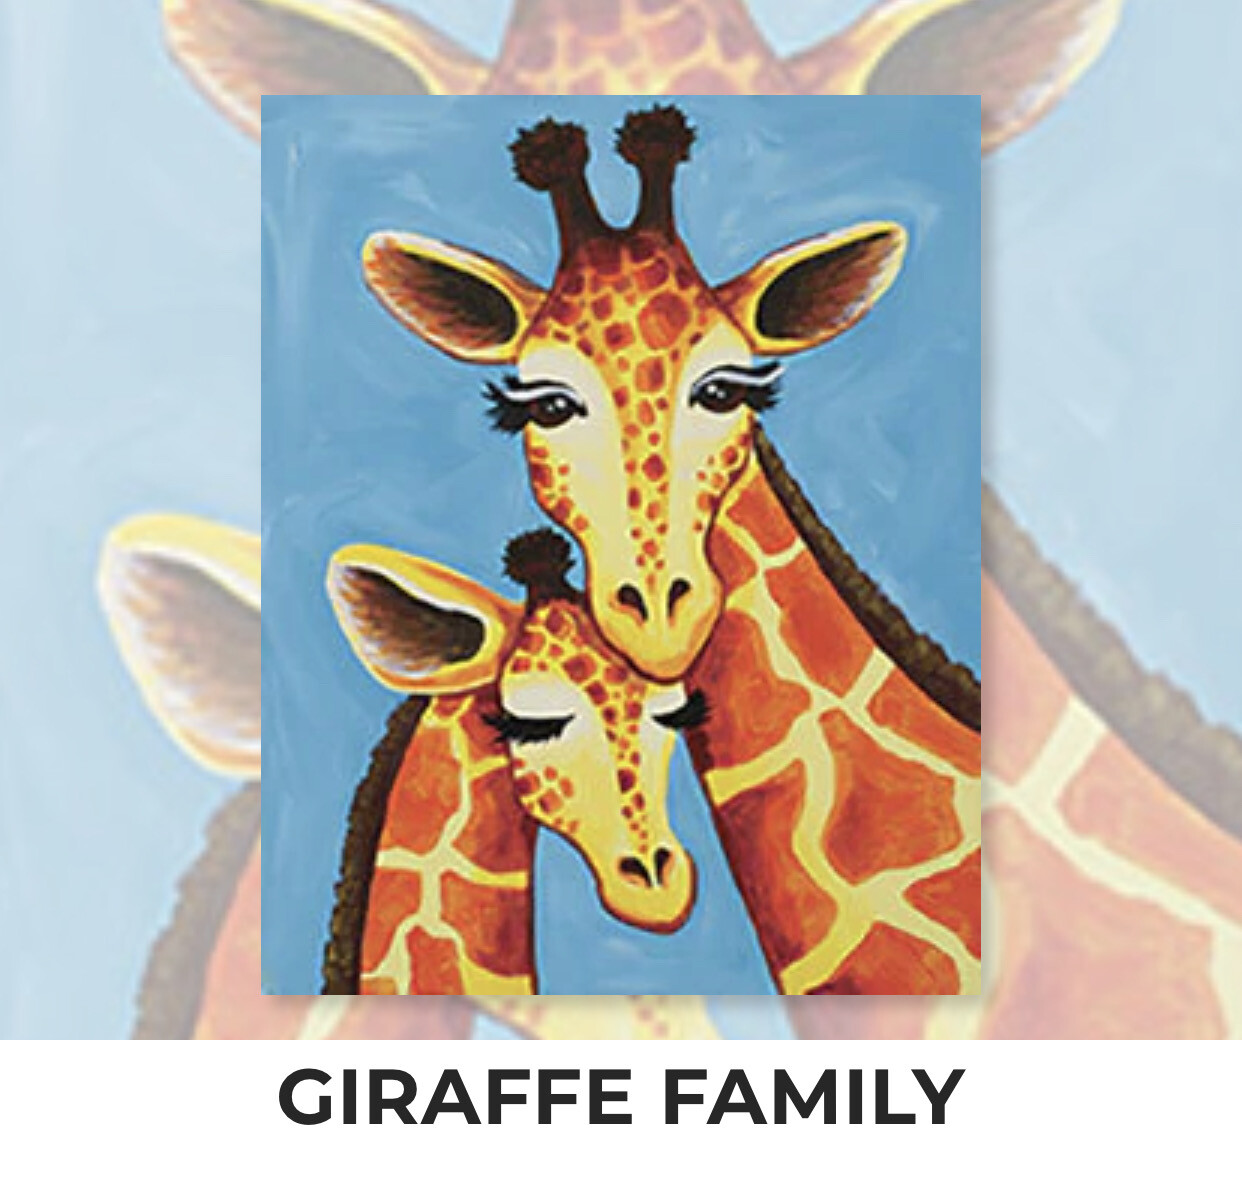 Giraffe Family ADULT Acrylic Paint On Canvas DIY Art Kit - 3 Week Special Order